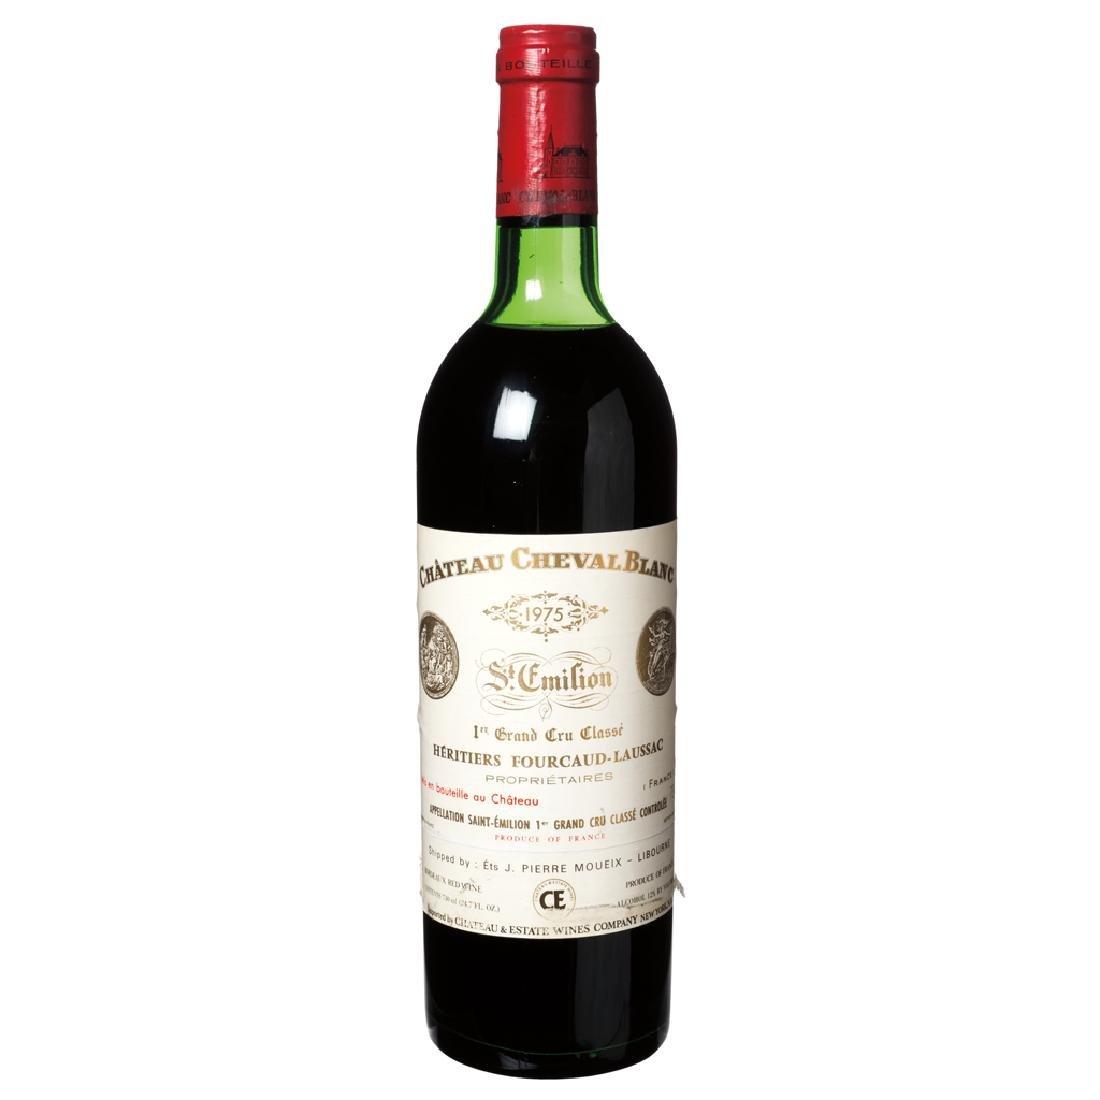 Chateau Cheval Blanc. Vintage 1975. 1er Grand Cru